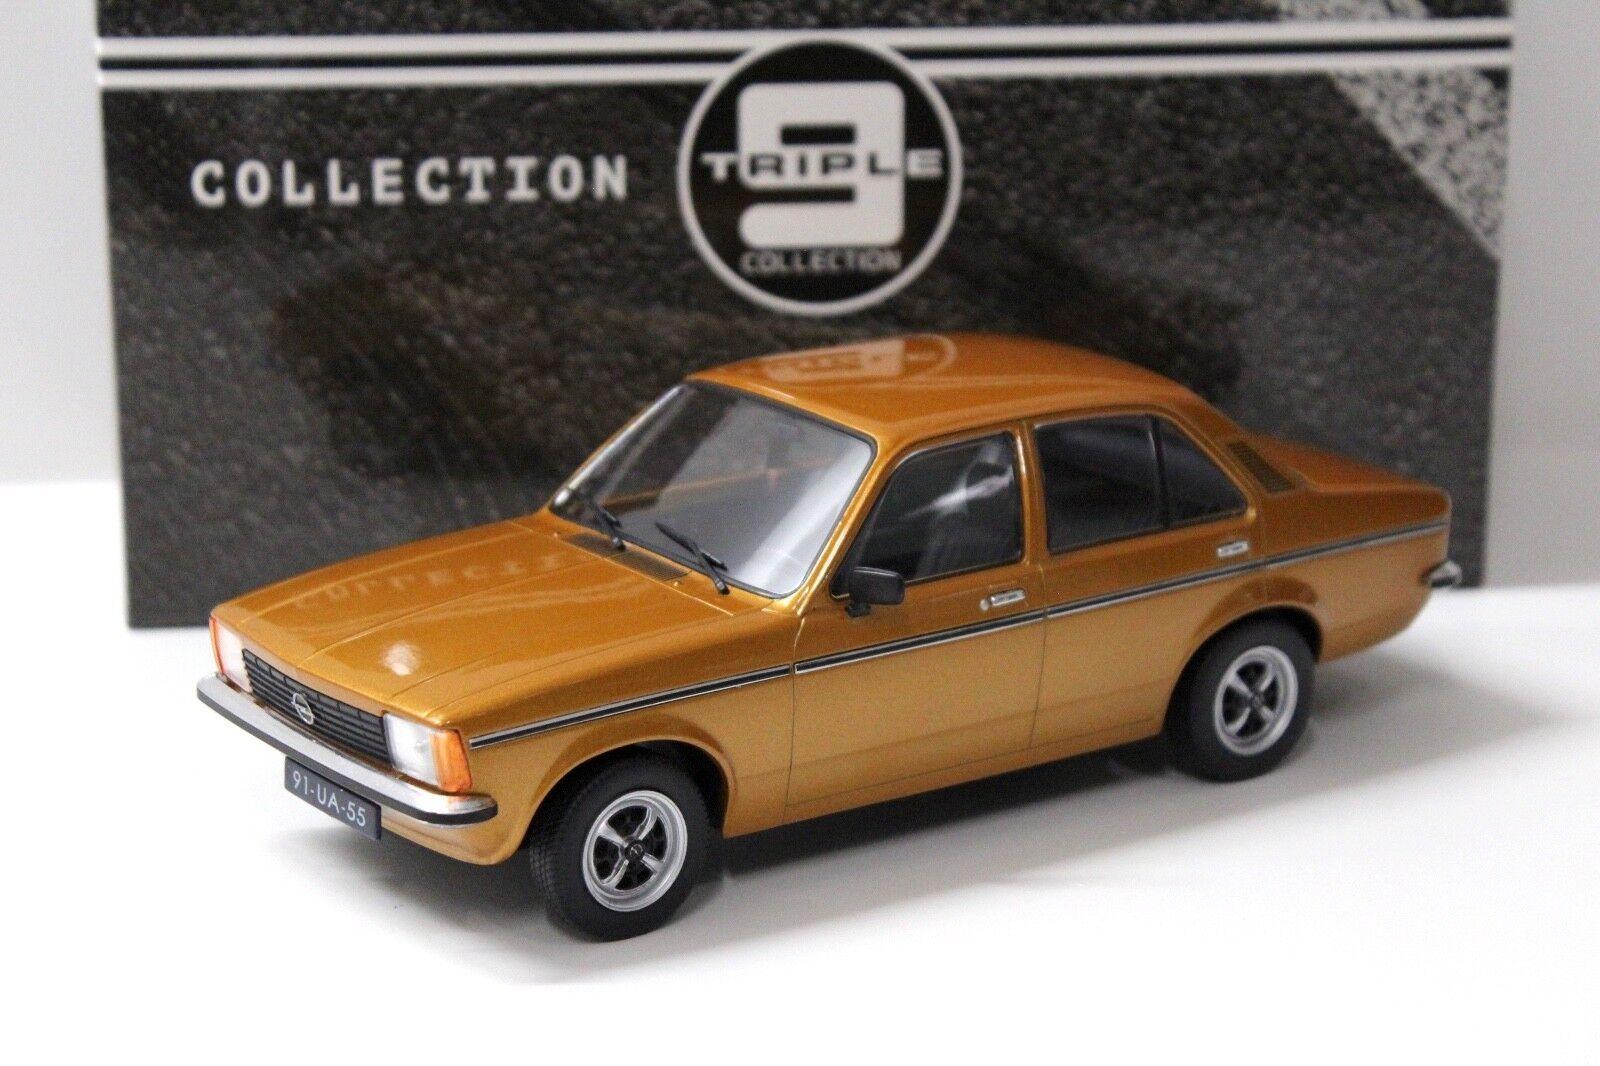 diseñador en linea 1 18 triple triple triple 9 Opel Kadett c2 sedan 4-Doors oro 1977 New en Premium-modelCoches  precios bajos